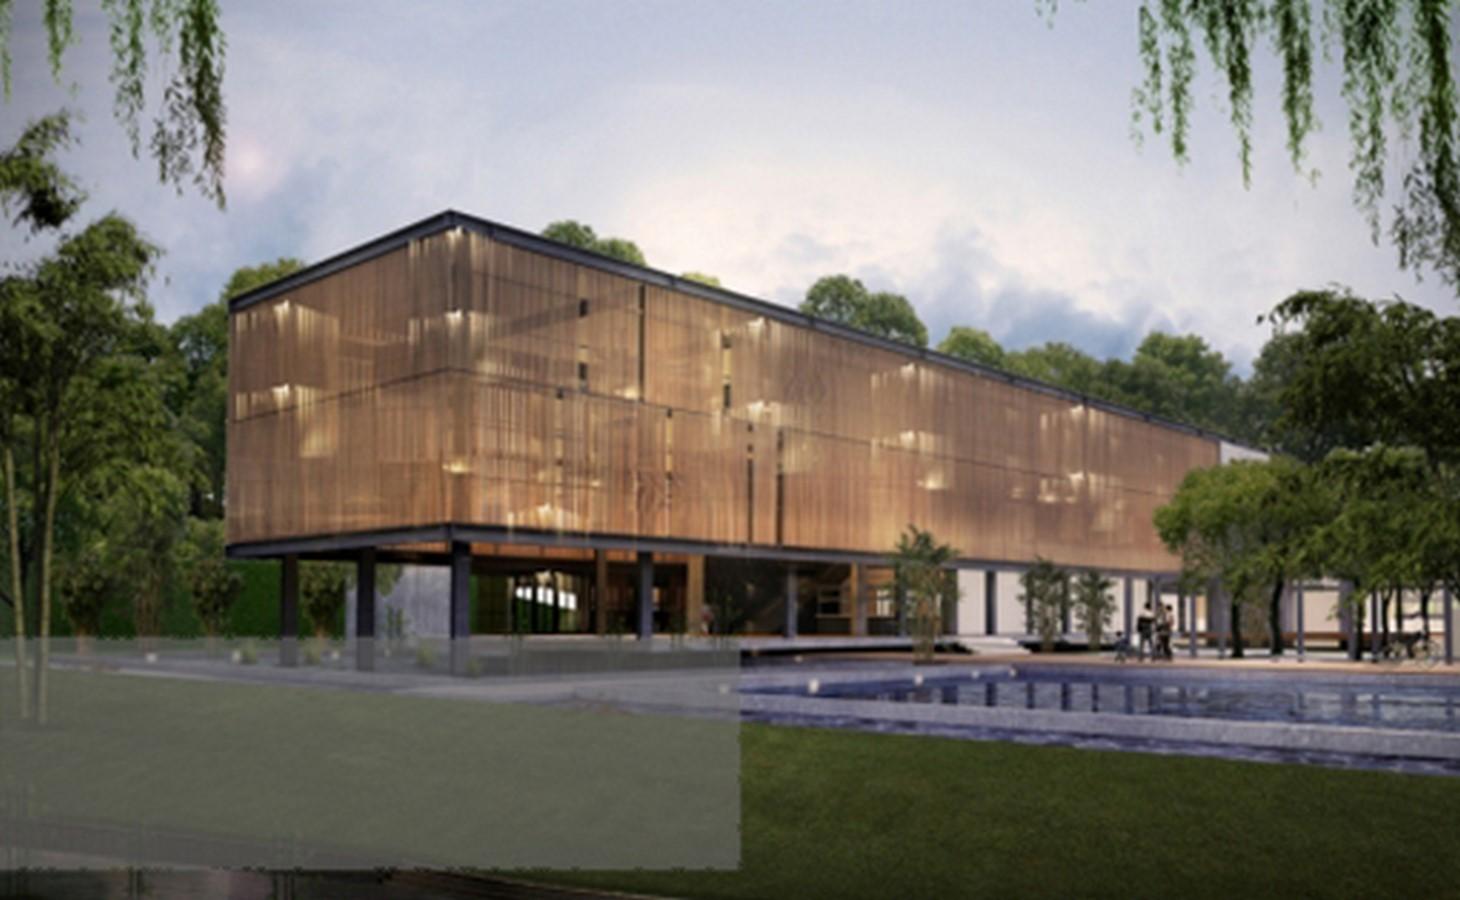 Architects in Petaling Jaya - Top 45 Architects in Petaling Jaya - Sheet13